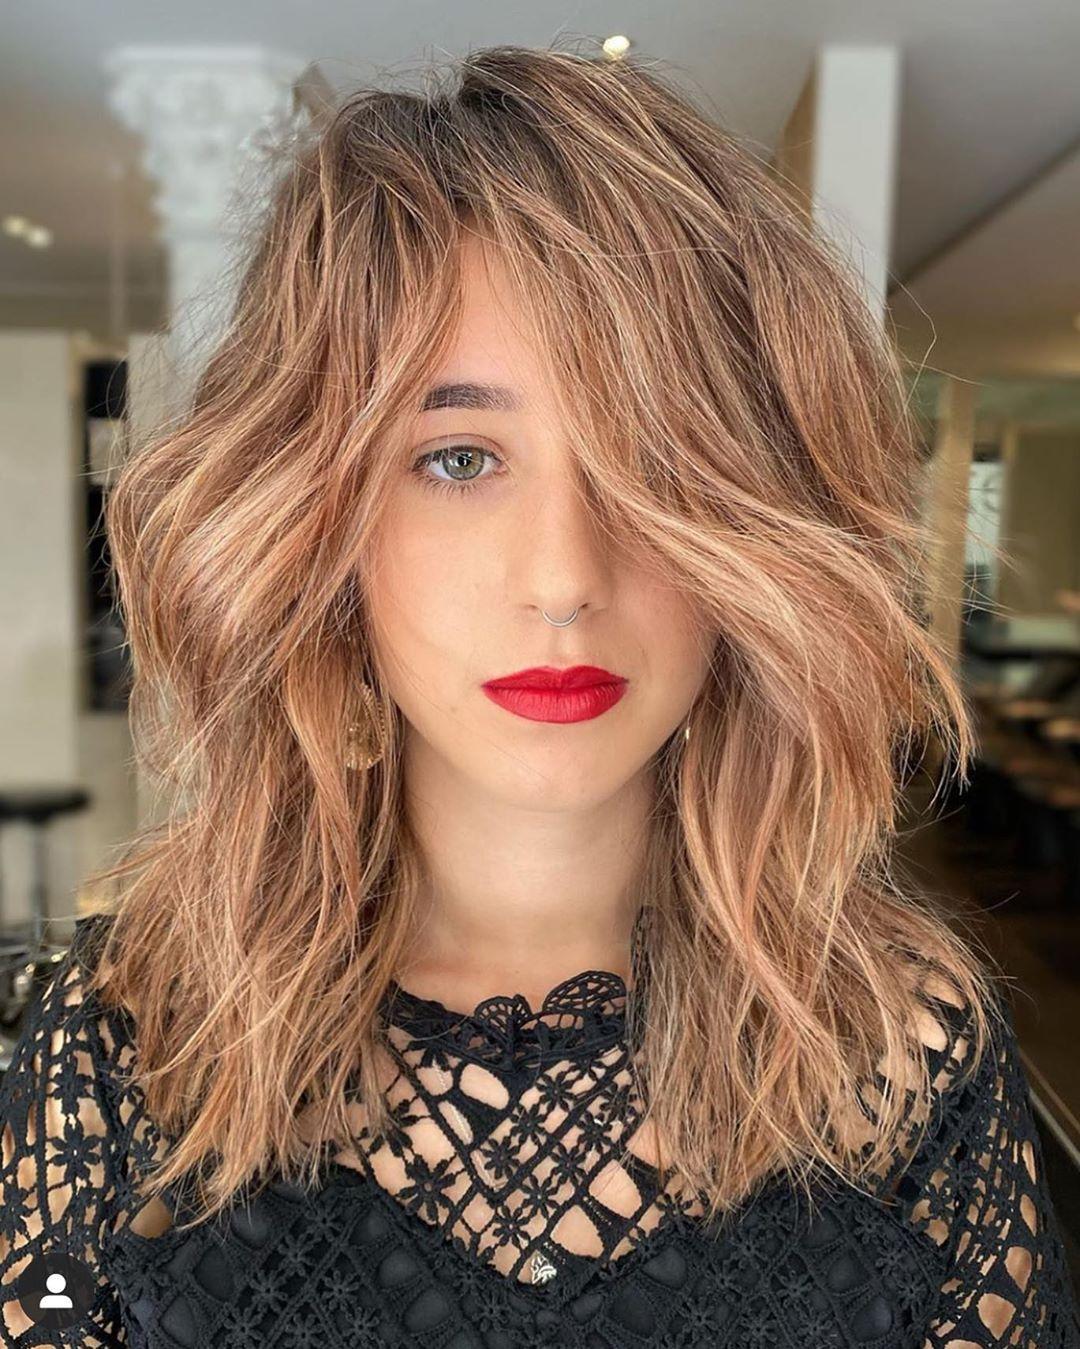 40 Newest Haircut Ideas And Haircut Trends For 2020 Hair Adviser